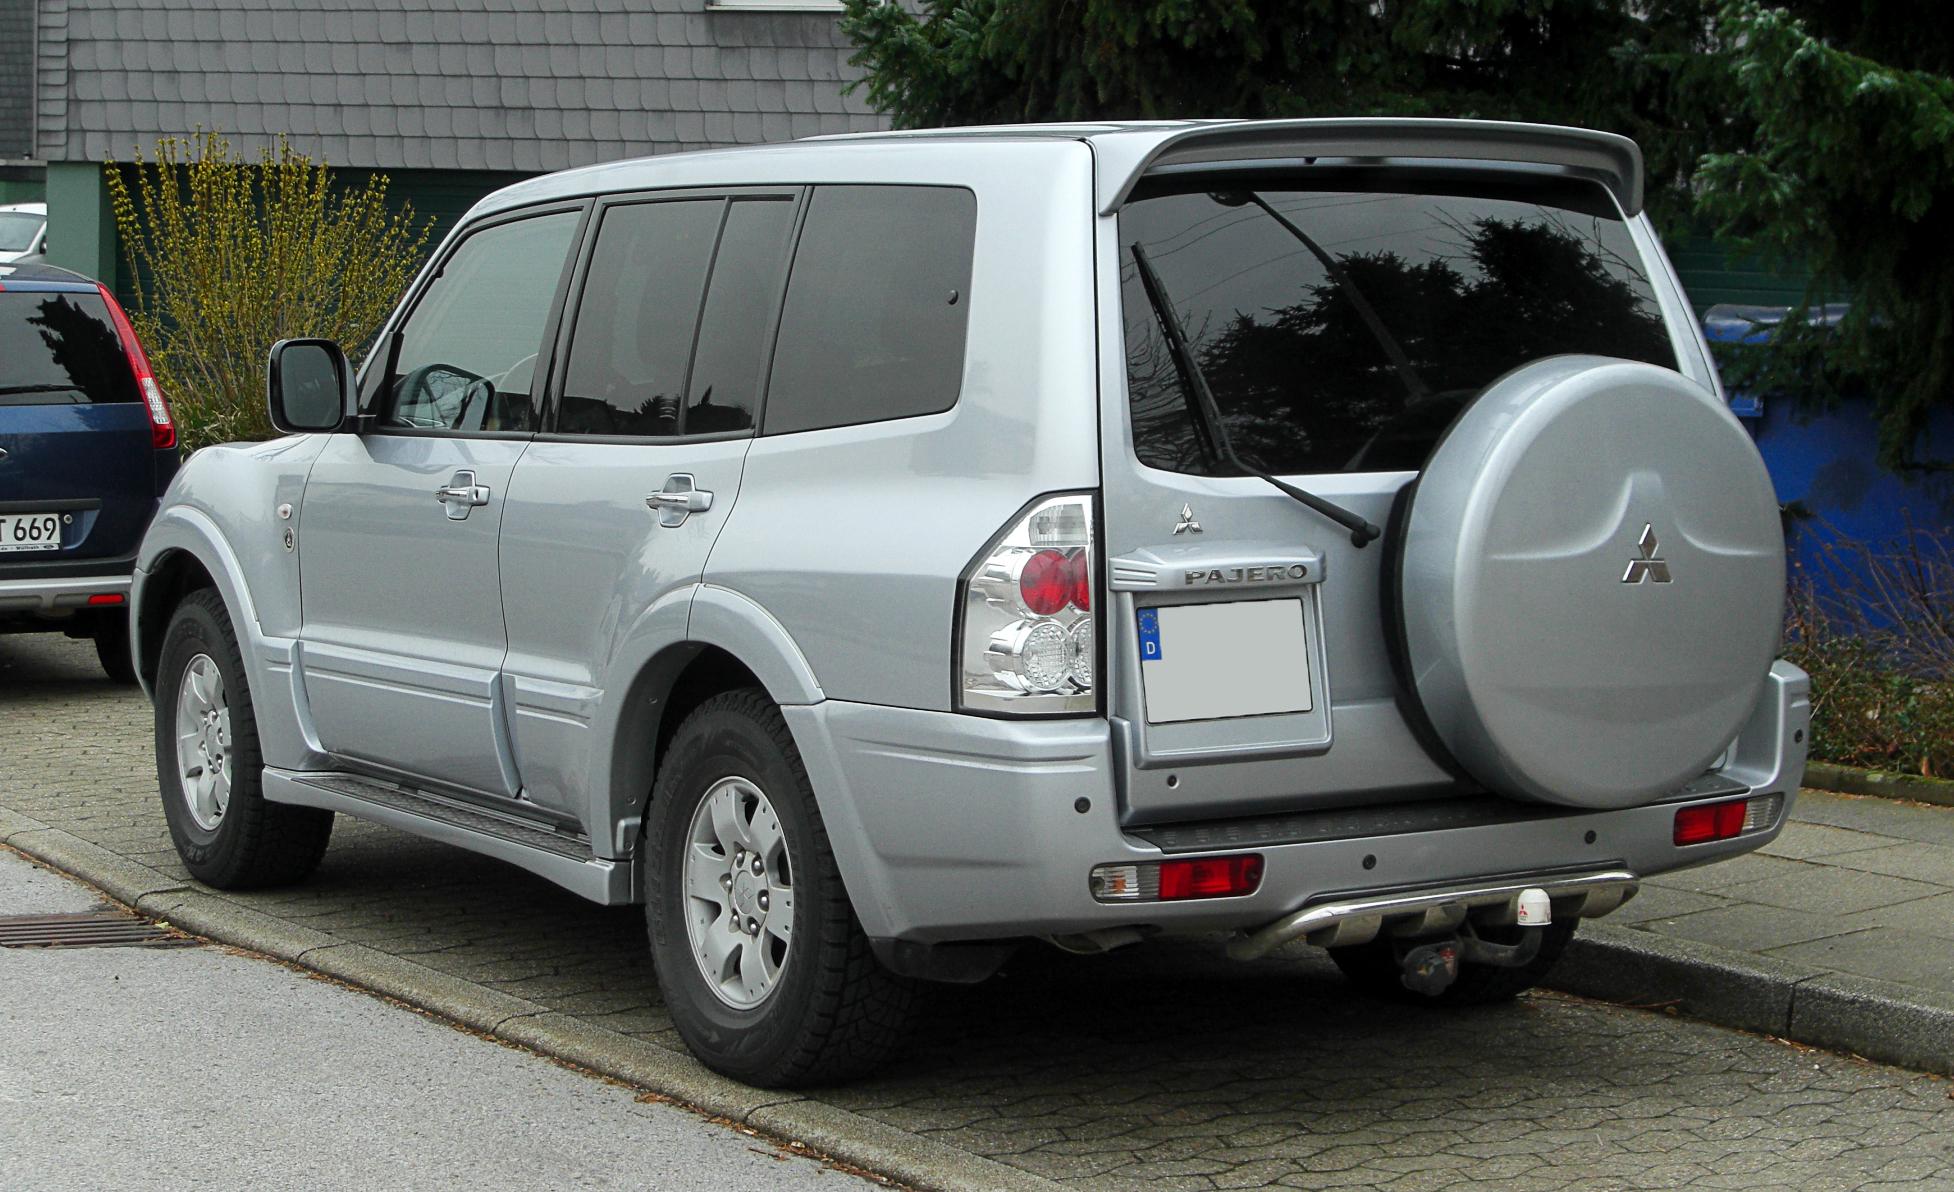 Mitsubishi pajero 3.2 di-d at, madled светодиодная ...